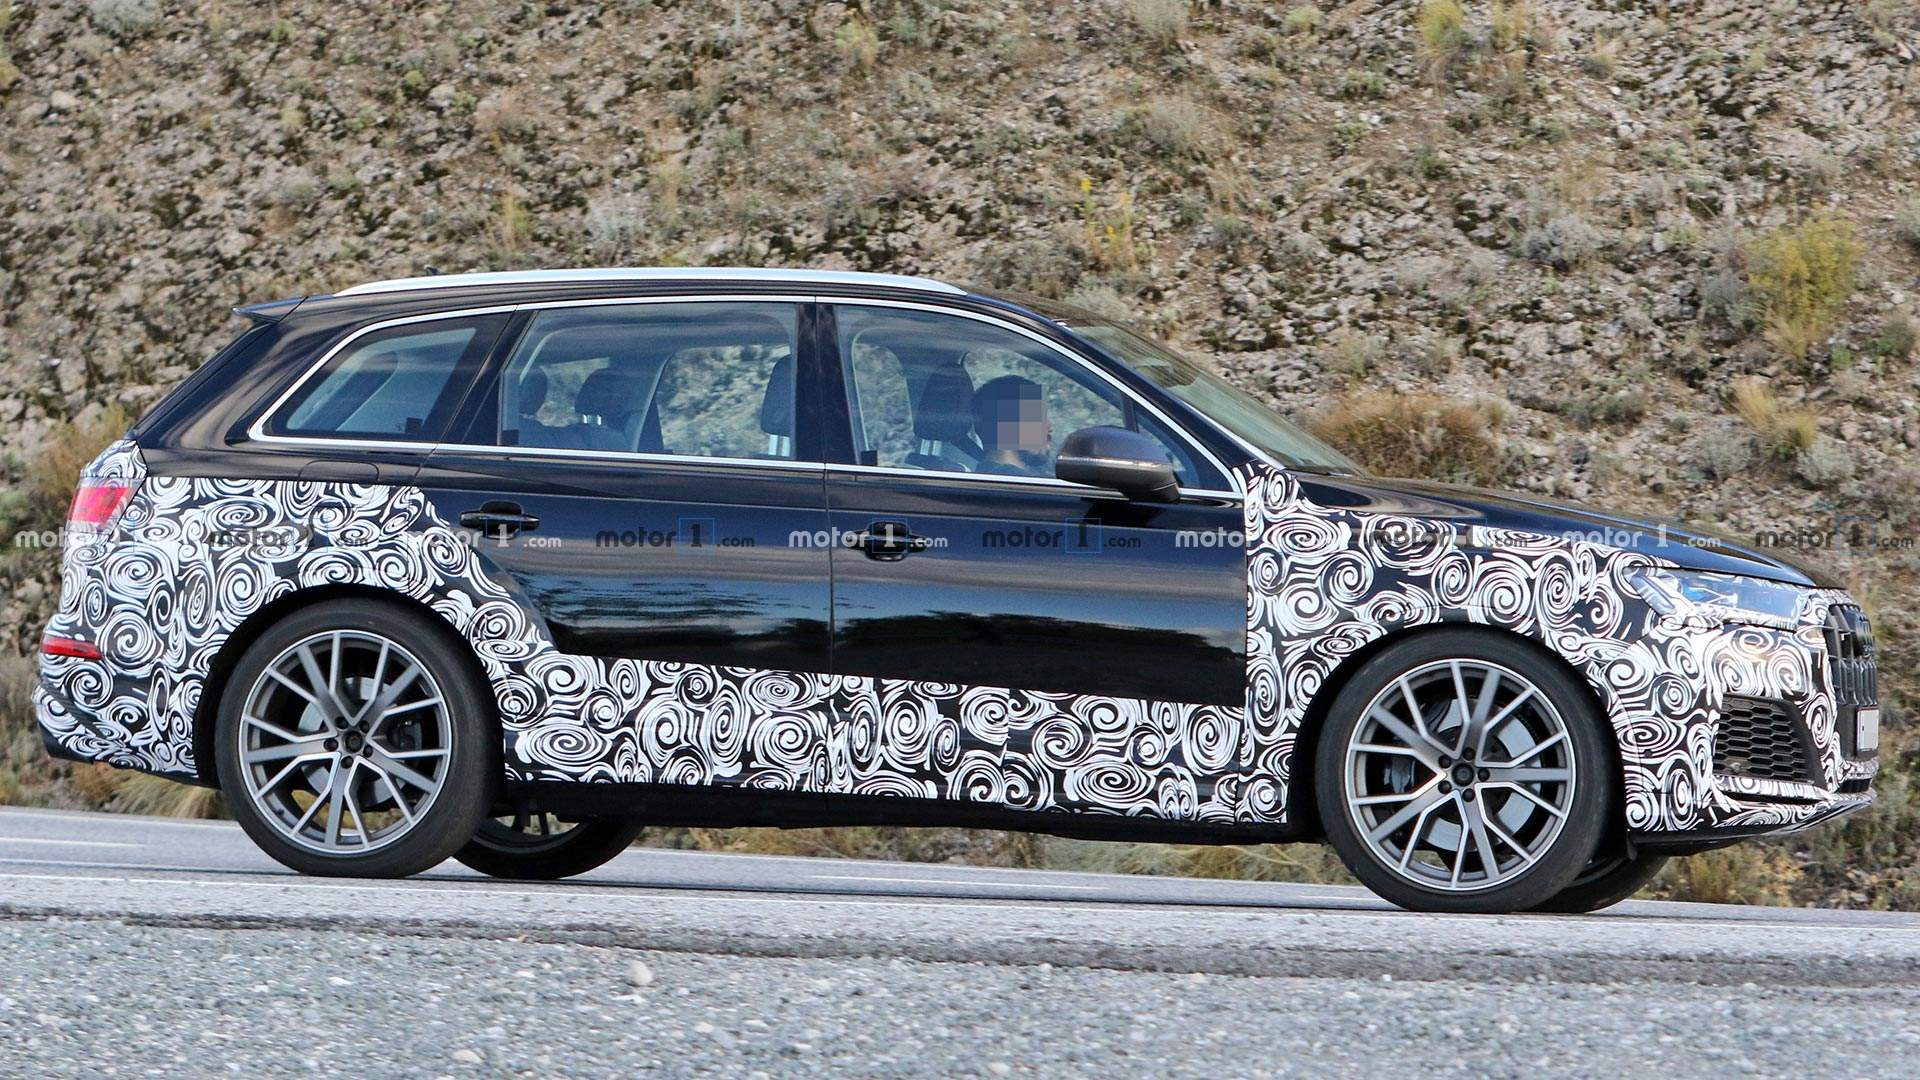 2020 - [Audi] Q7 restylé  Audi-sq7-refresh-spy-shots